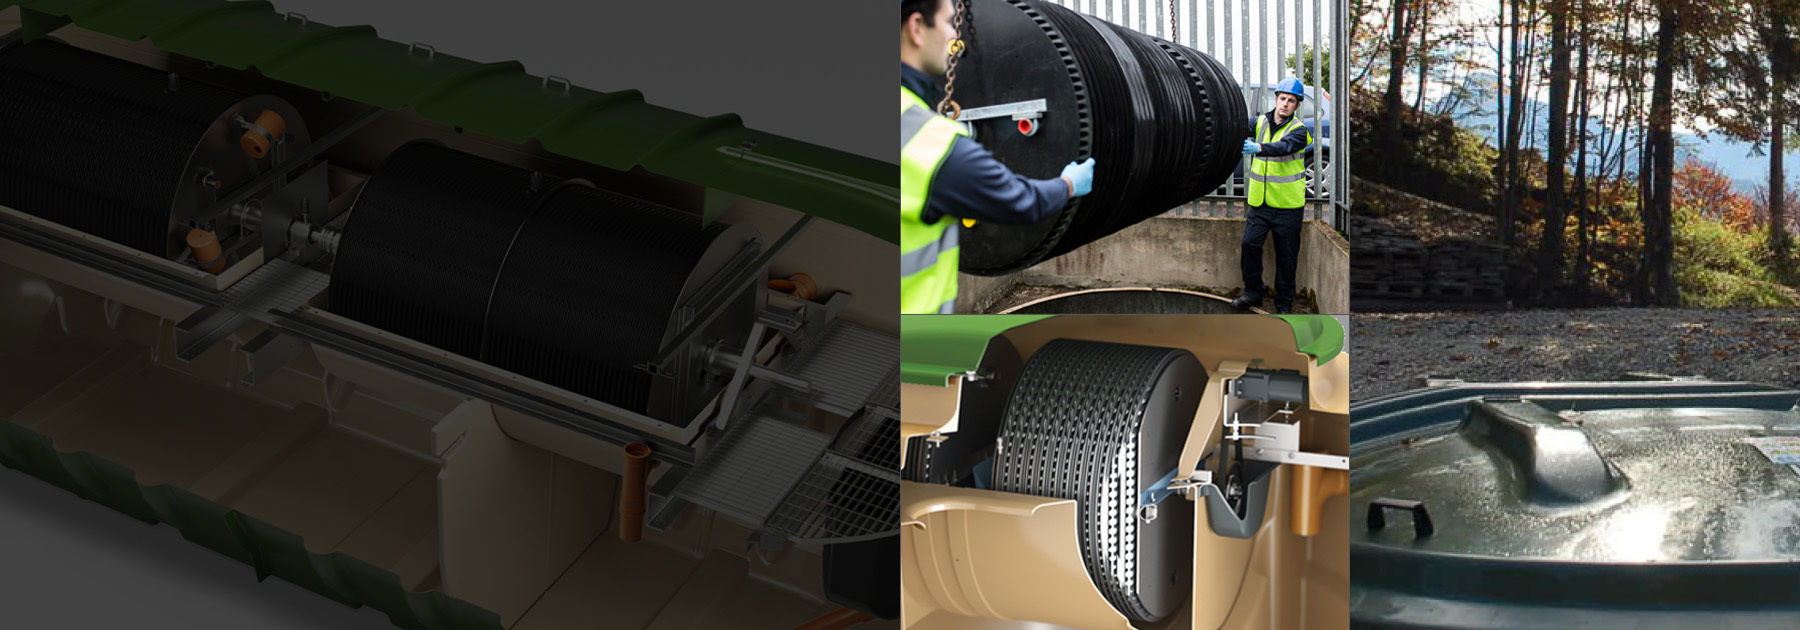 GR Sewage Treatment SUBPG